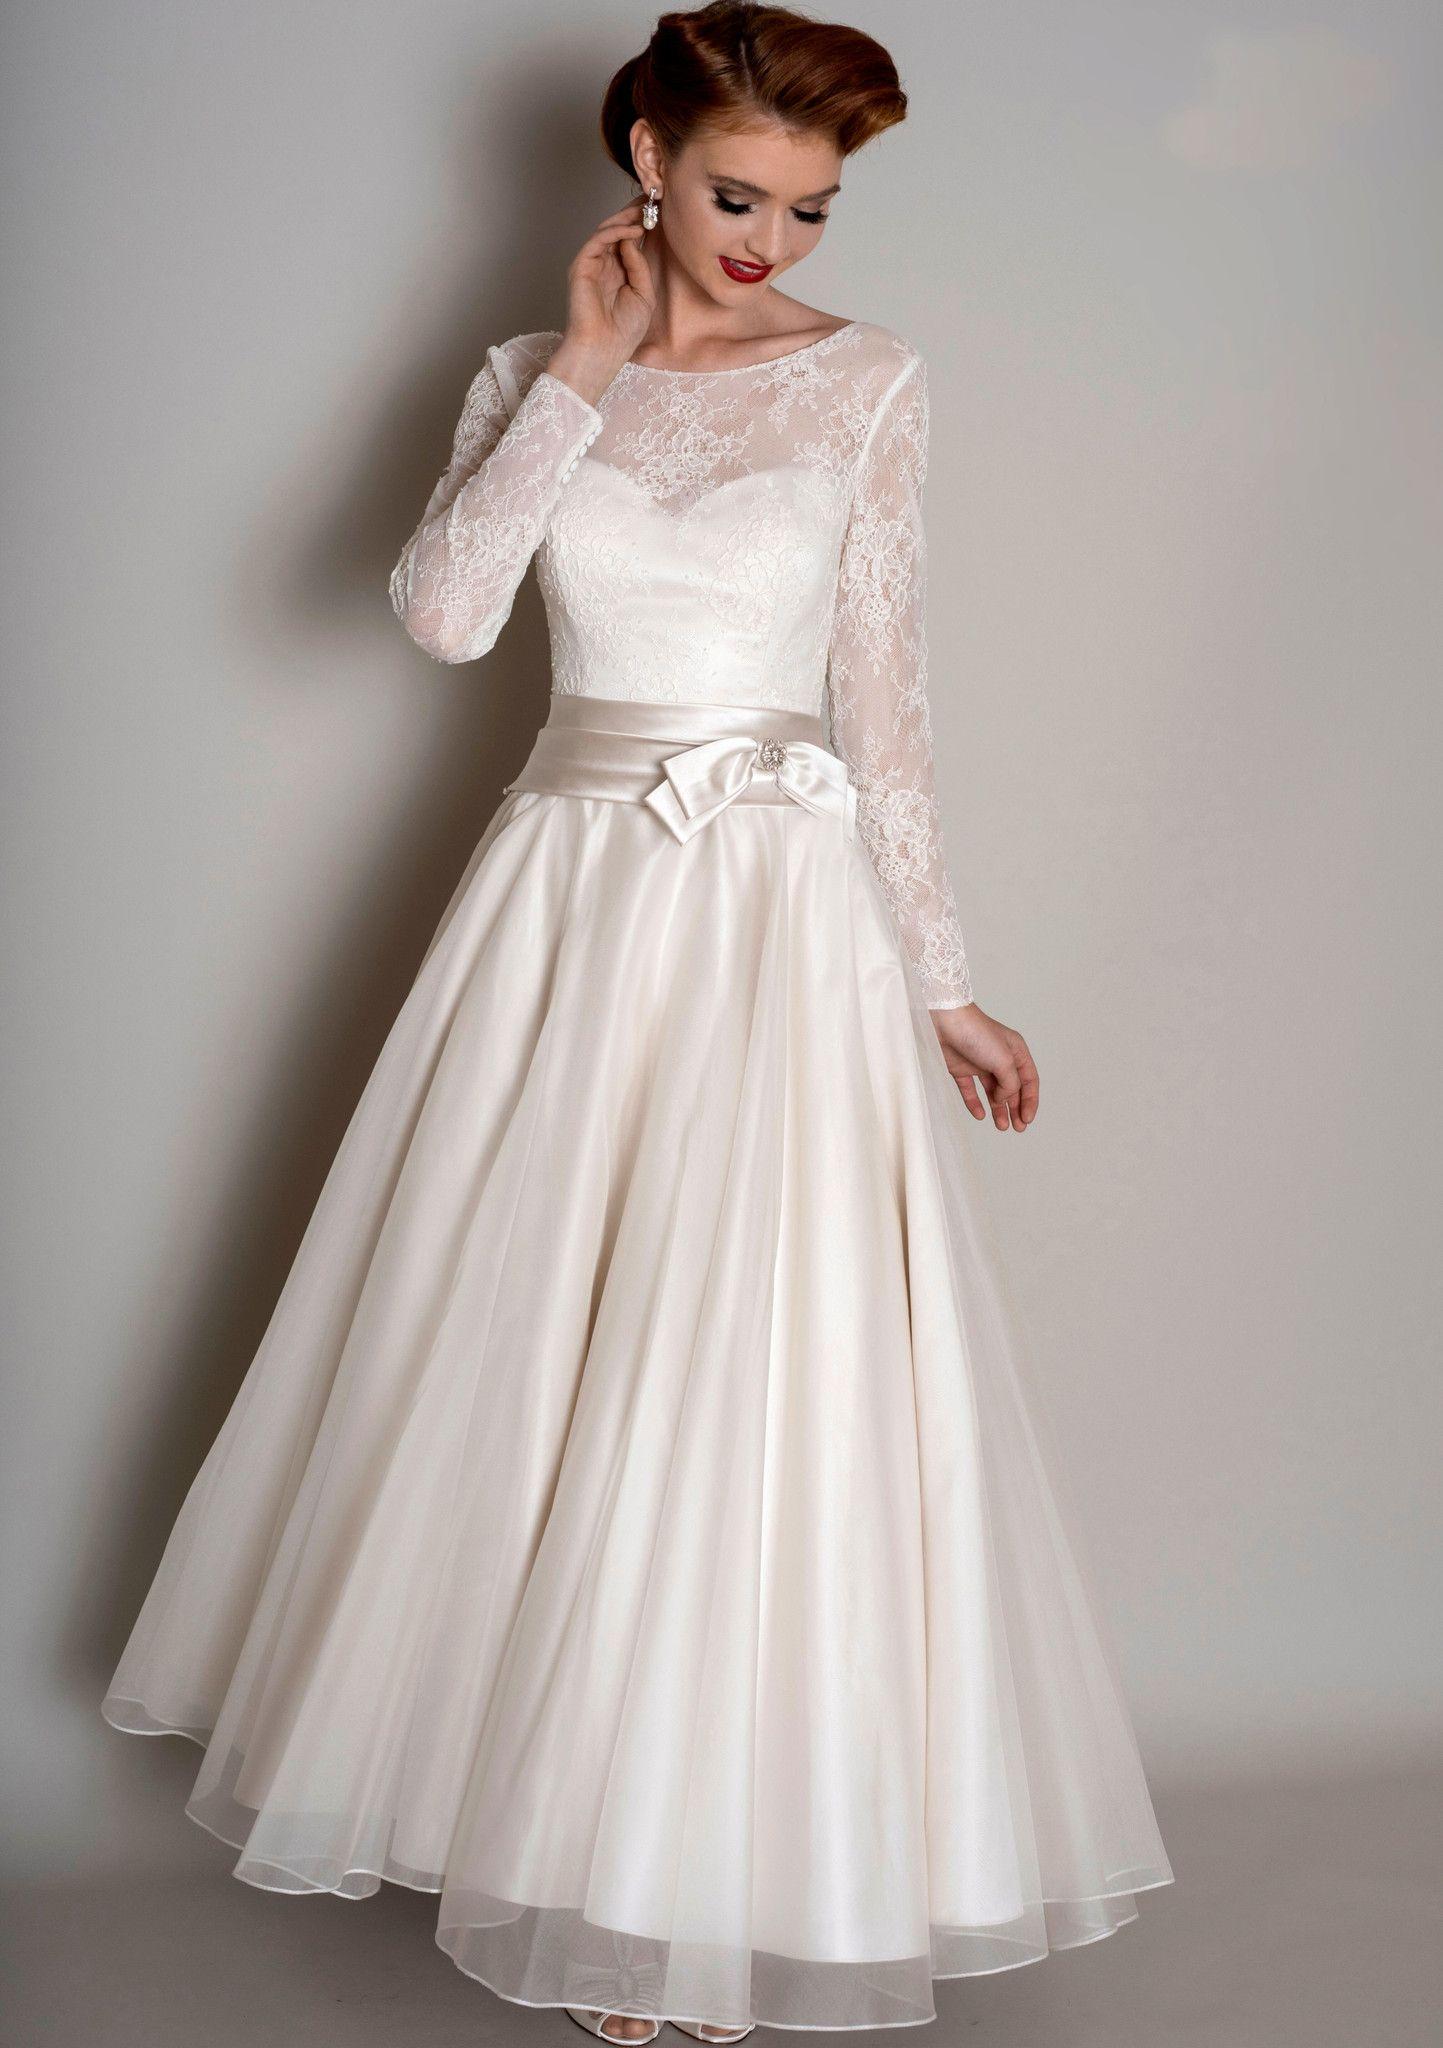 Tea Length Wedding Dresses50's Short Wedding Dress